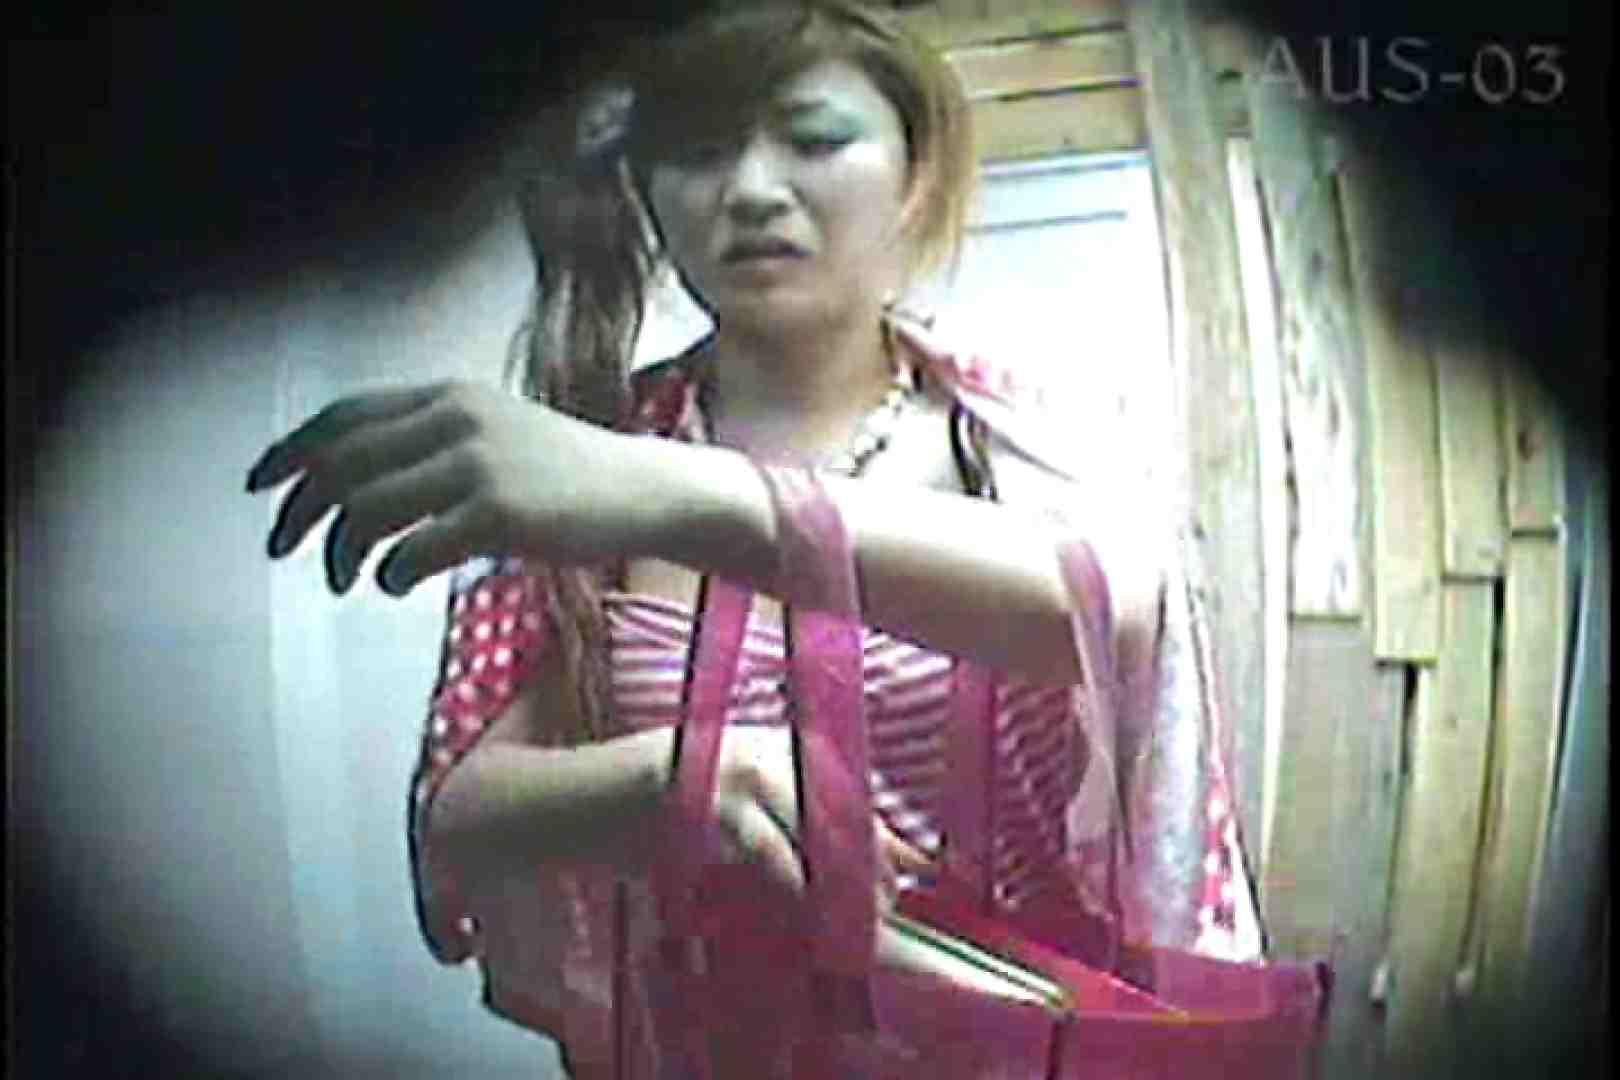 露天風呂脱衣所お着替え盗撮 Vol.03 盗撮  83PIX 23